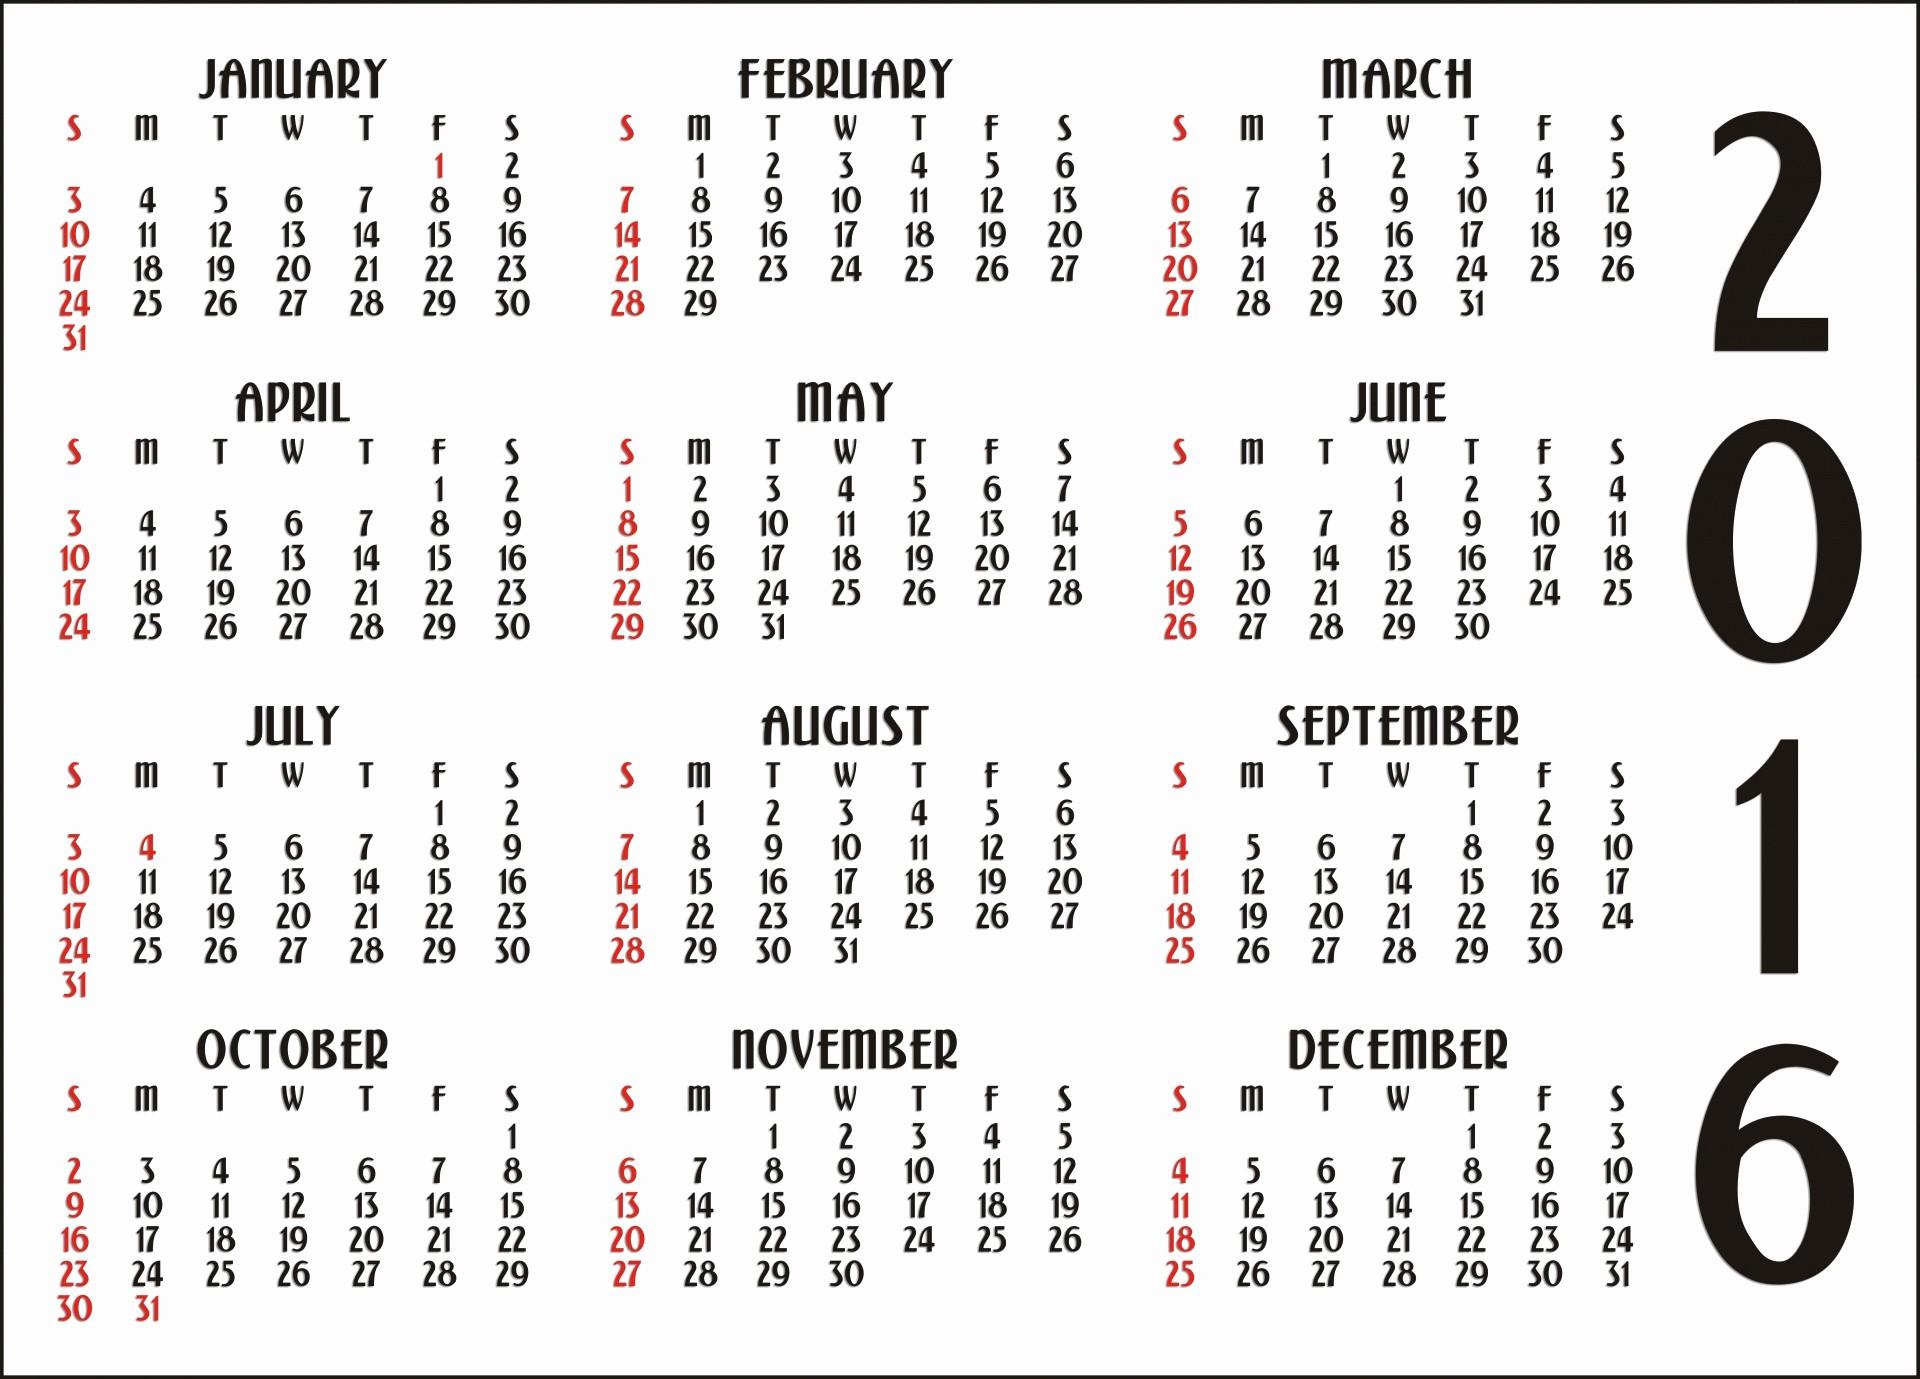 Free Printable 12 Month Calendar Fresh 12 Month E Page Calendar Free Printable 12 Month